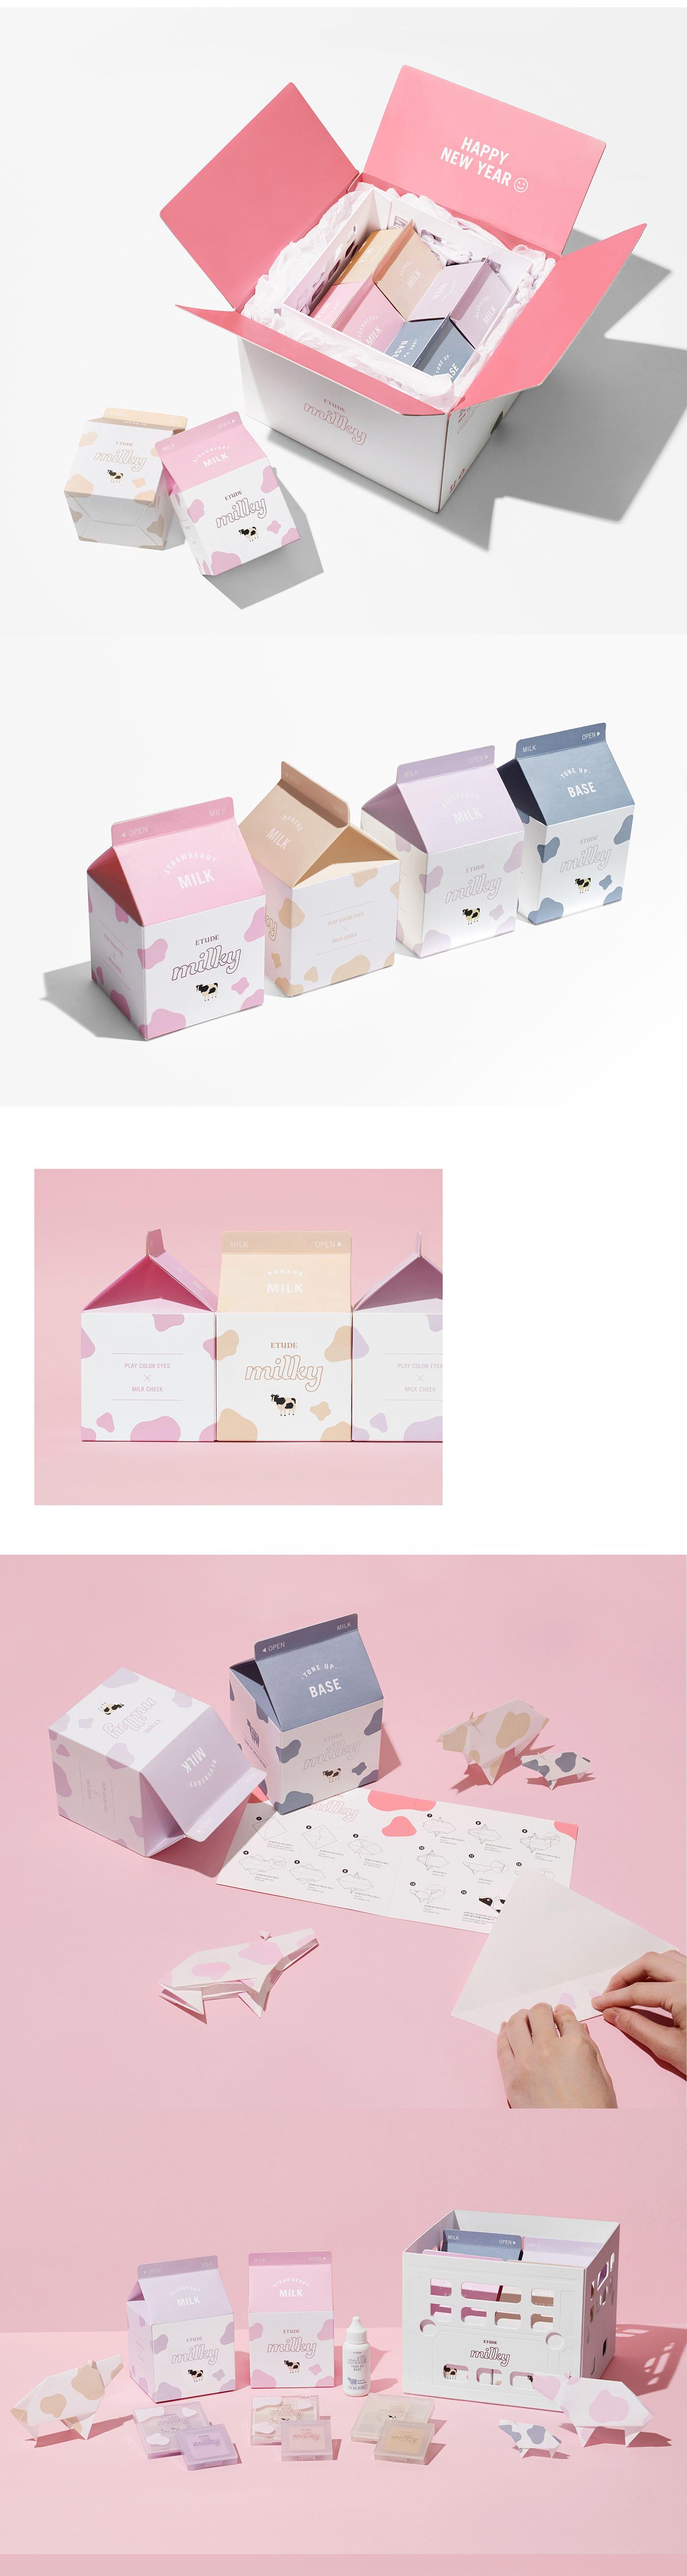 BEAUTY PACKAGE branding  influence kit package design  press kit design